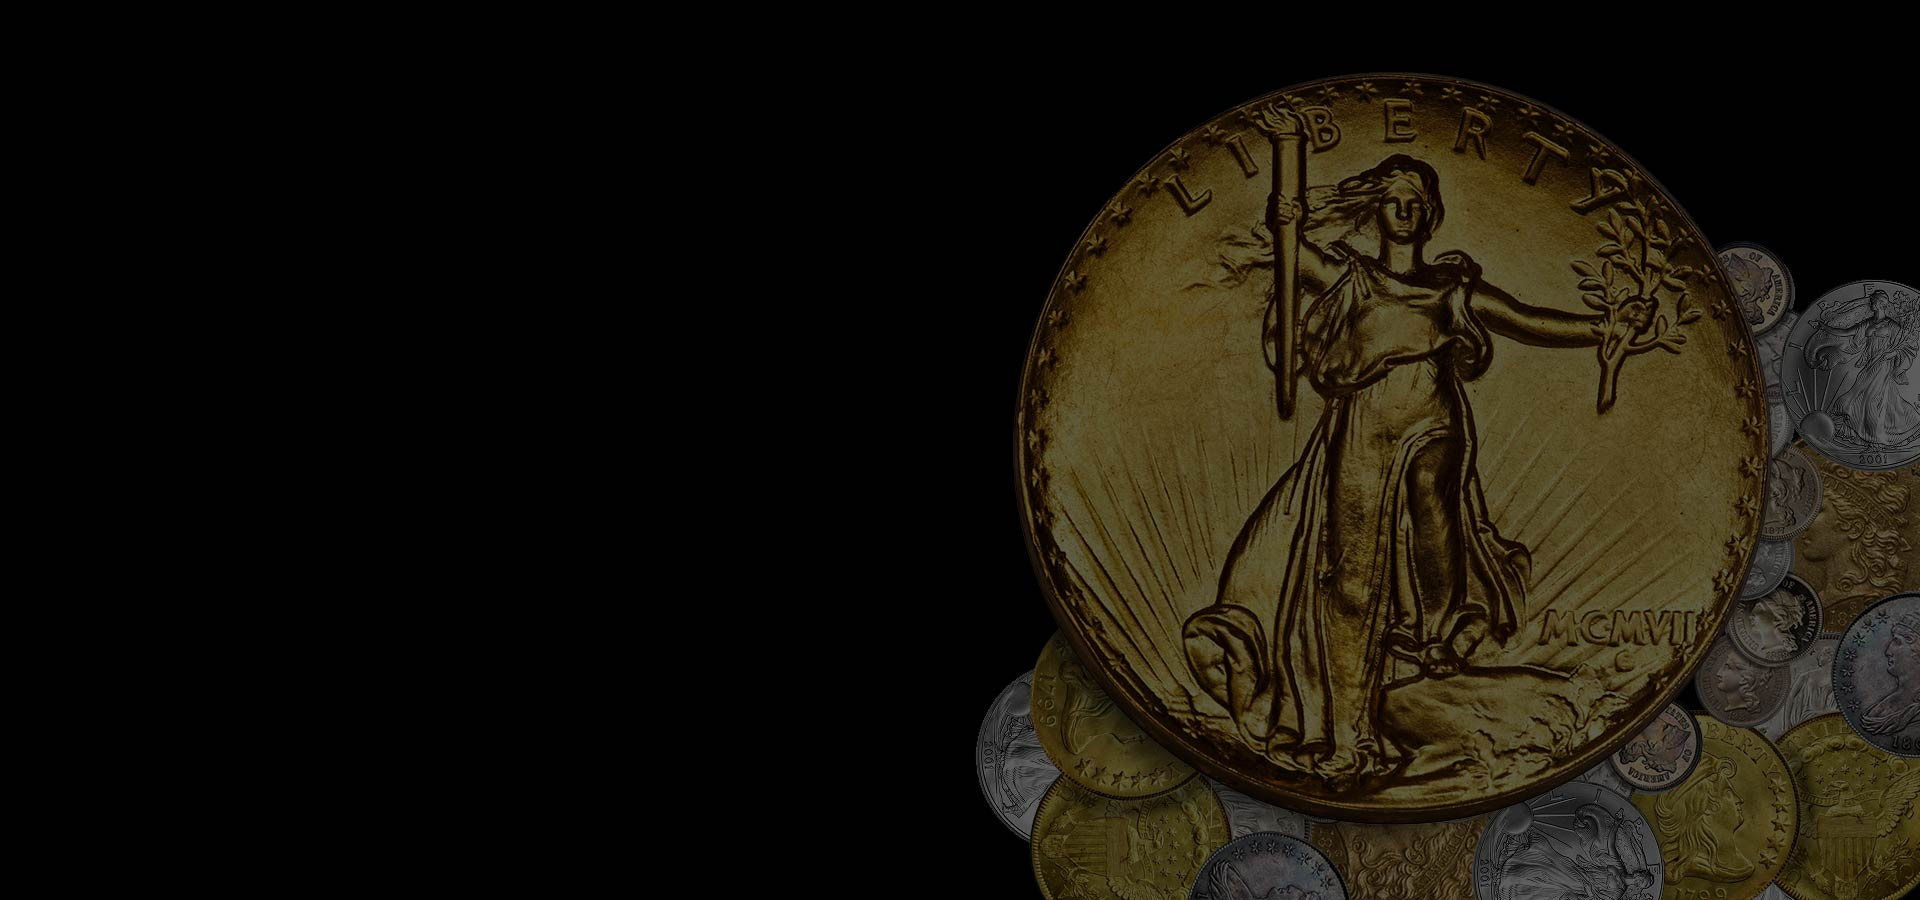 Harold B. Weitz, Inc. Pittsburgh Rare Coin Dealer